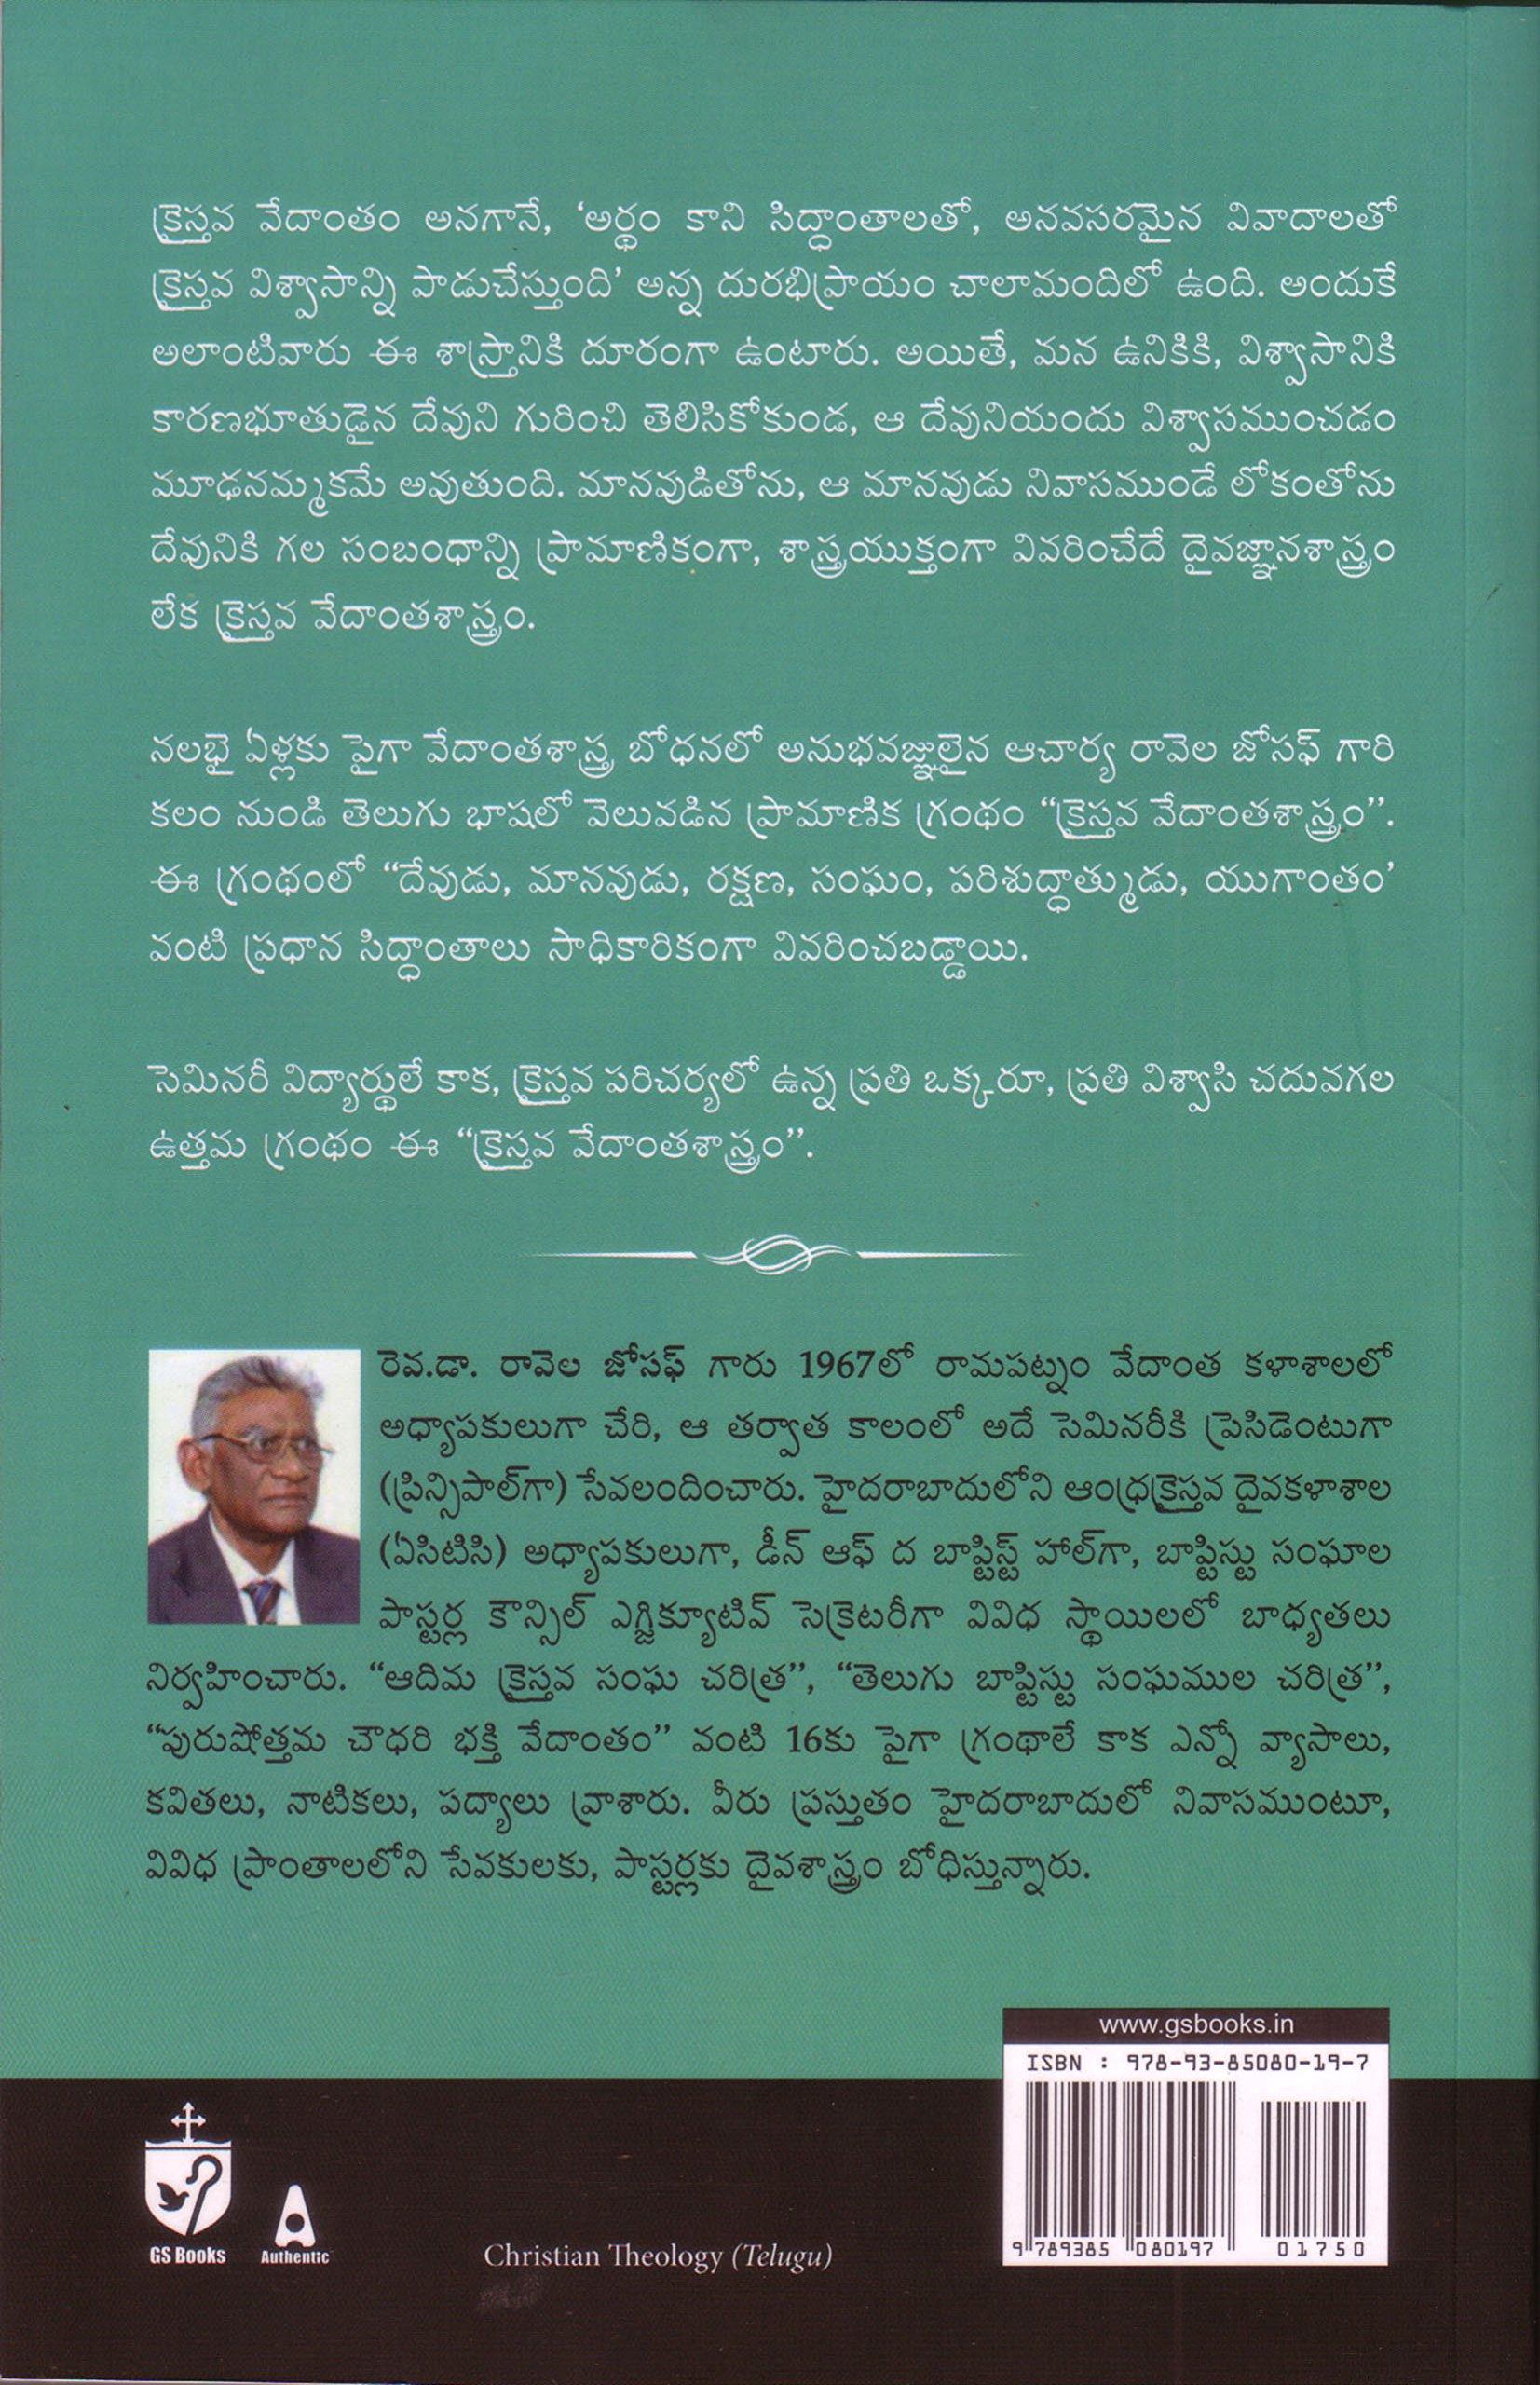 Buy Christian Theology - Telugu - Ravela Joseph Book Online at Low ...